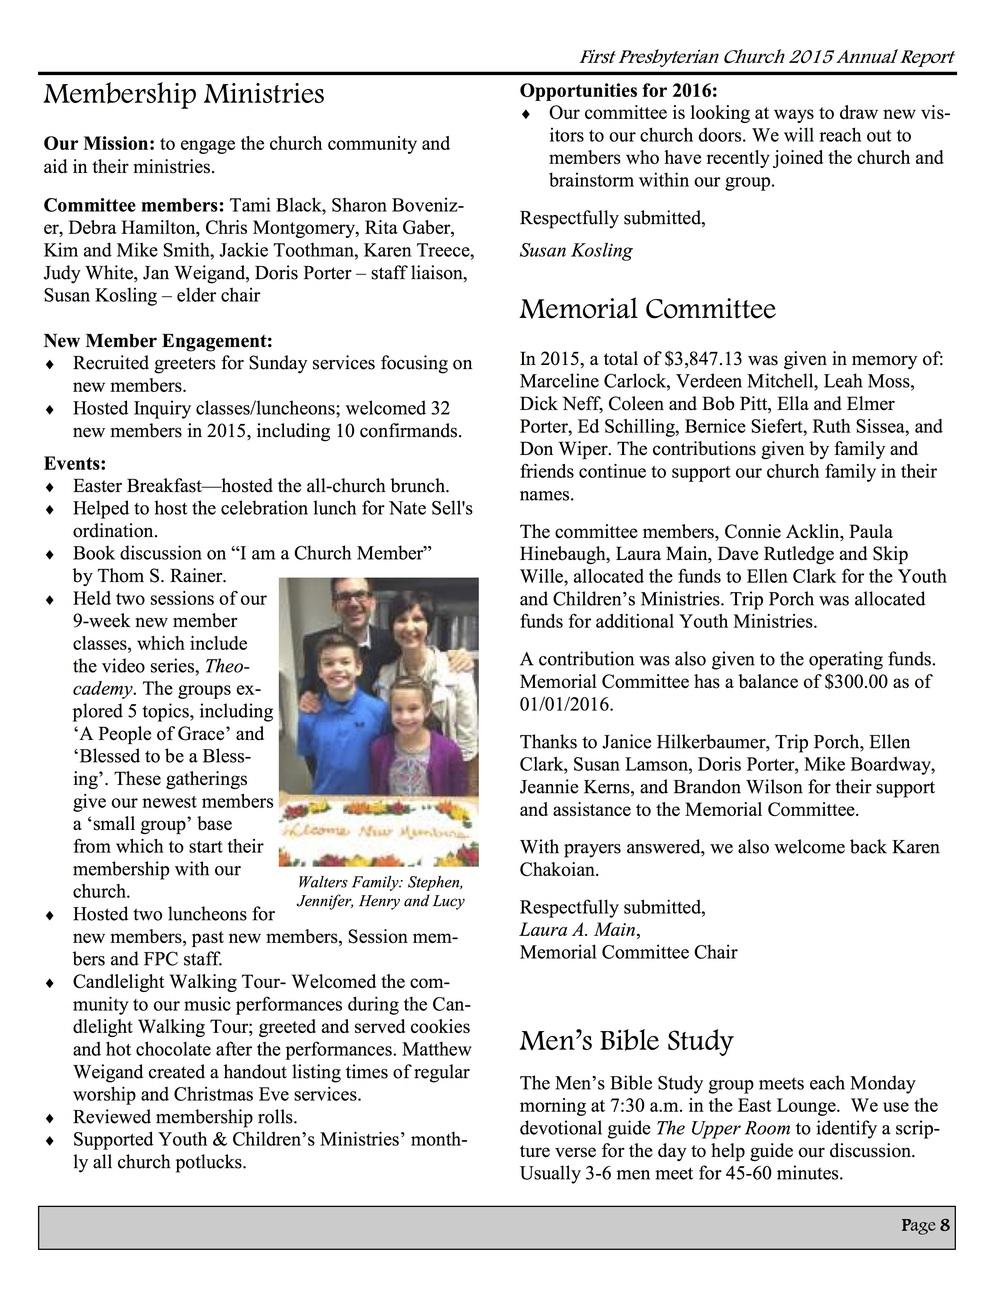 2015 Annual Report - 8.jpg